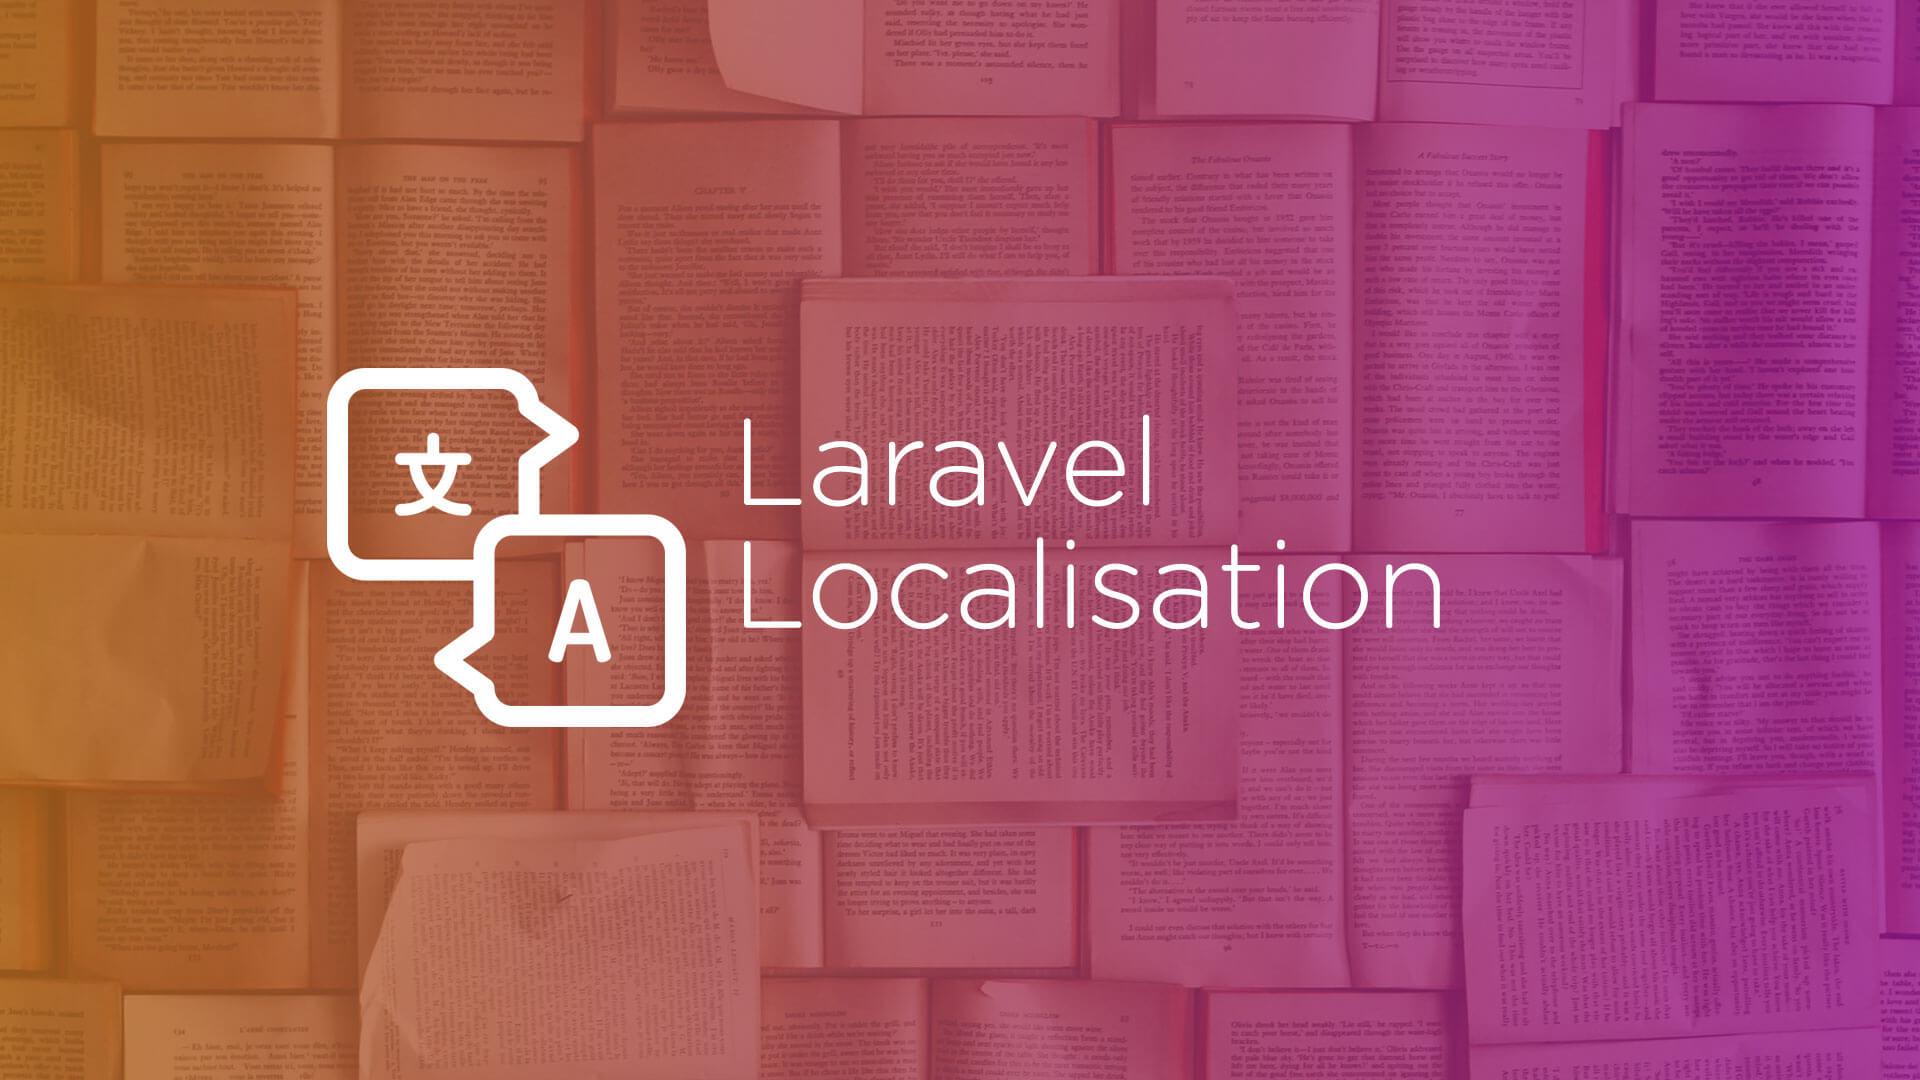 laravel localisation 1 - وبلاگ